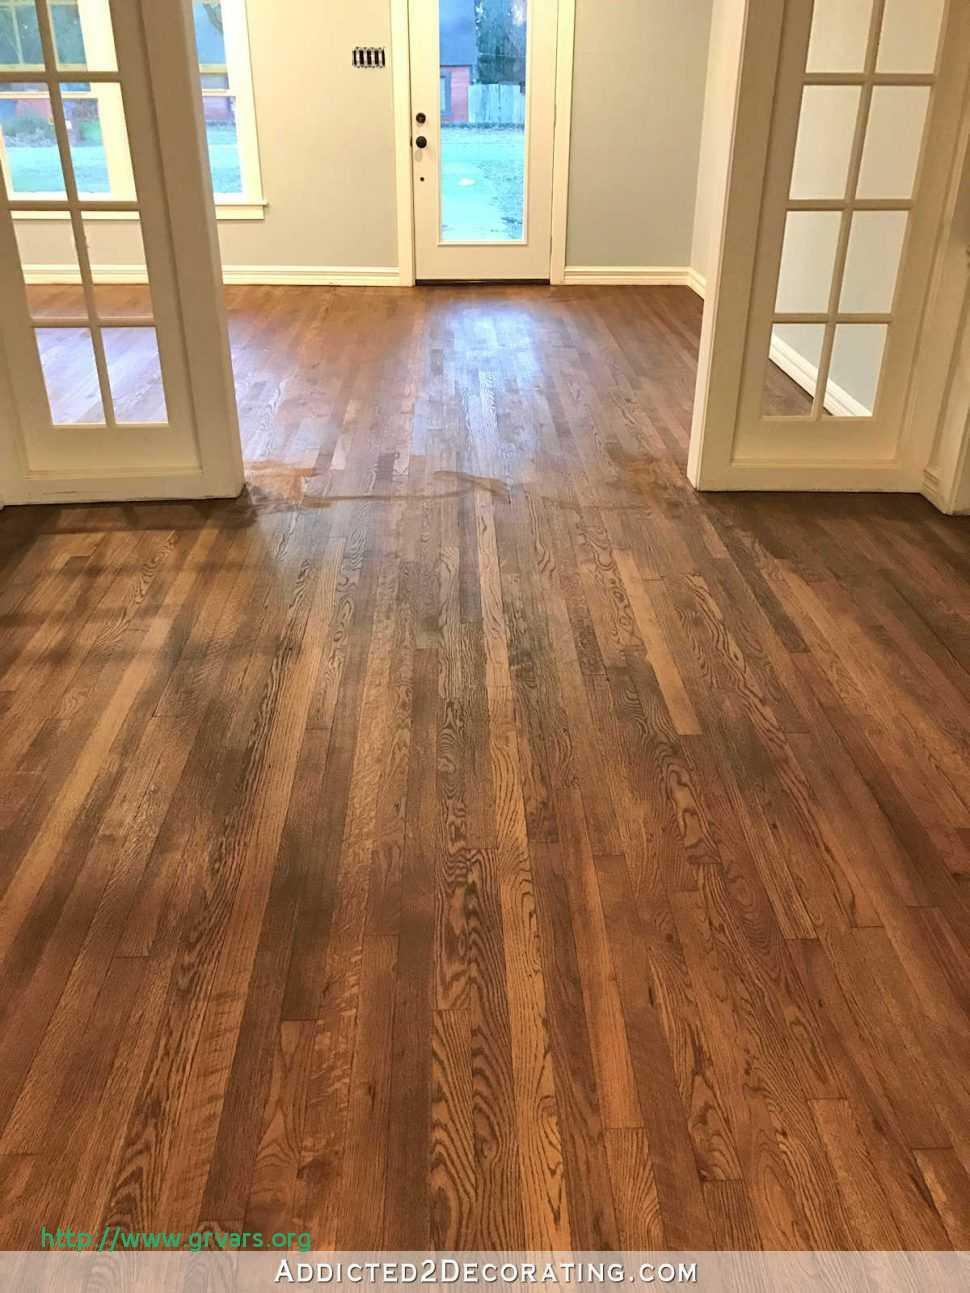 somerset red oak hardwood flooring of 25 inspirant somerset hardwood floor cleaner ideas blog pertaining to hardwood floor design types hardwood floors refinishing inspiration wide plank red oak flooring